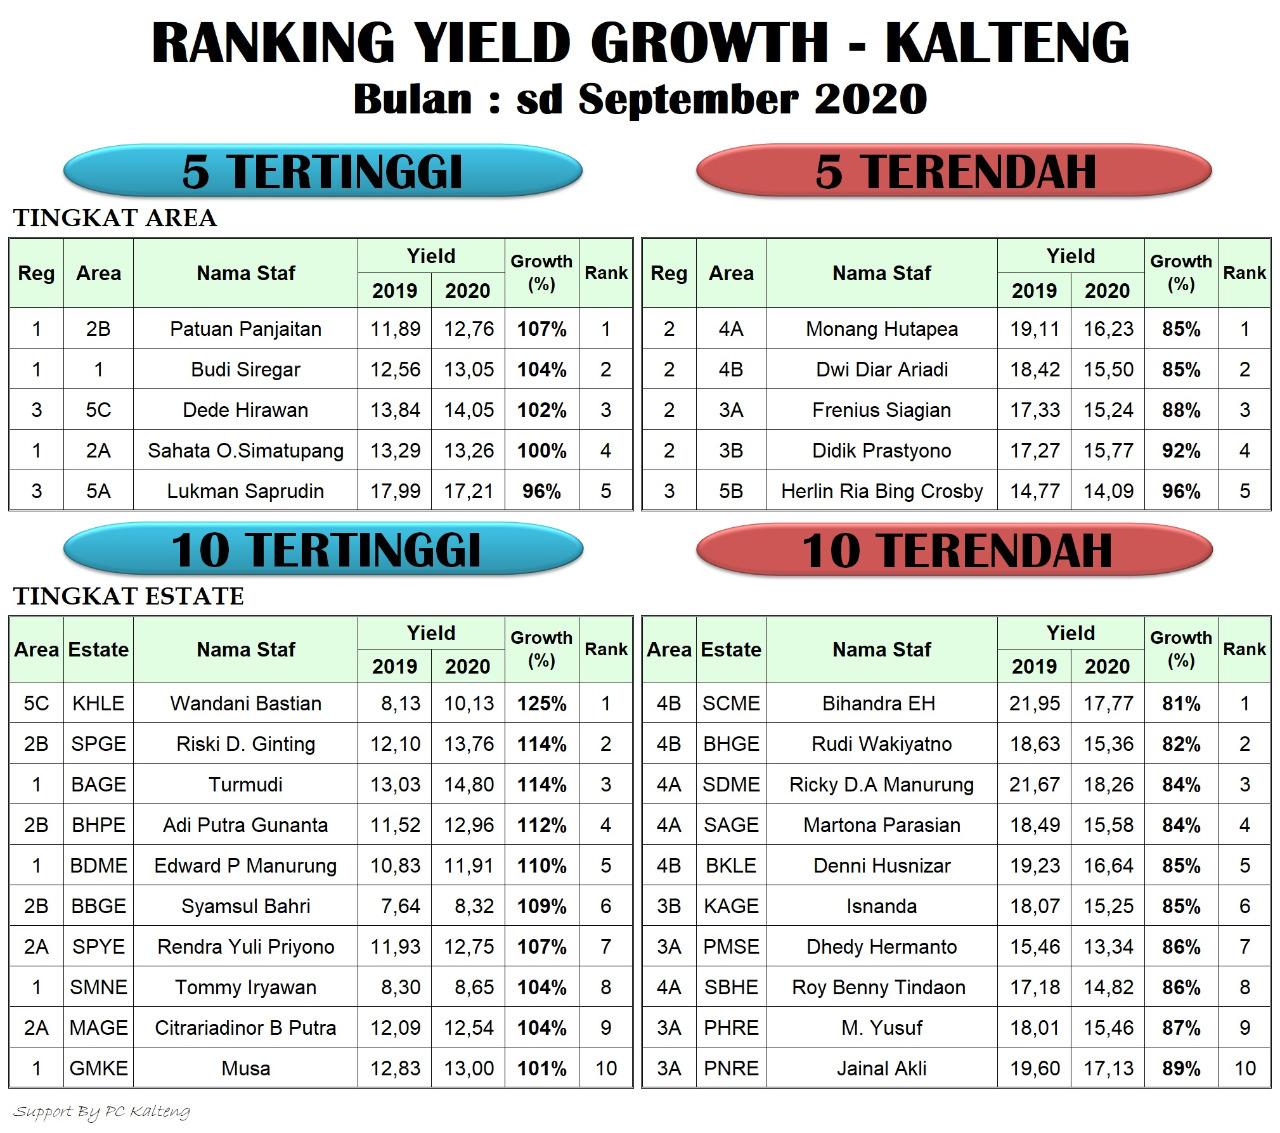 Rangking Yield Growth KalTeng - sd September 2020